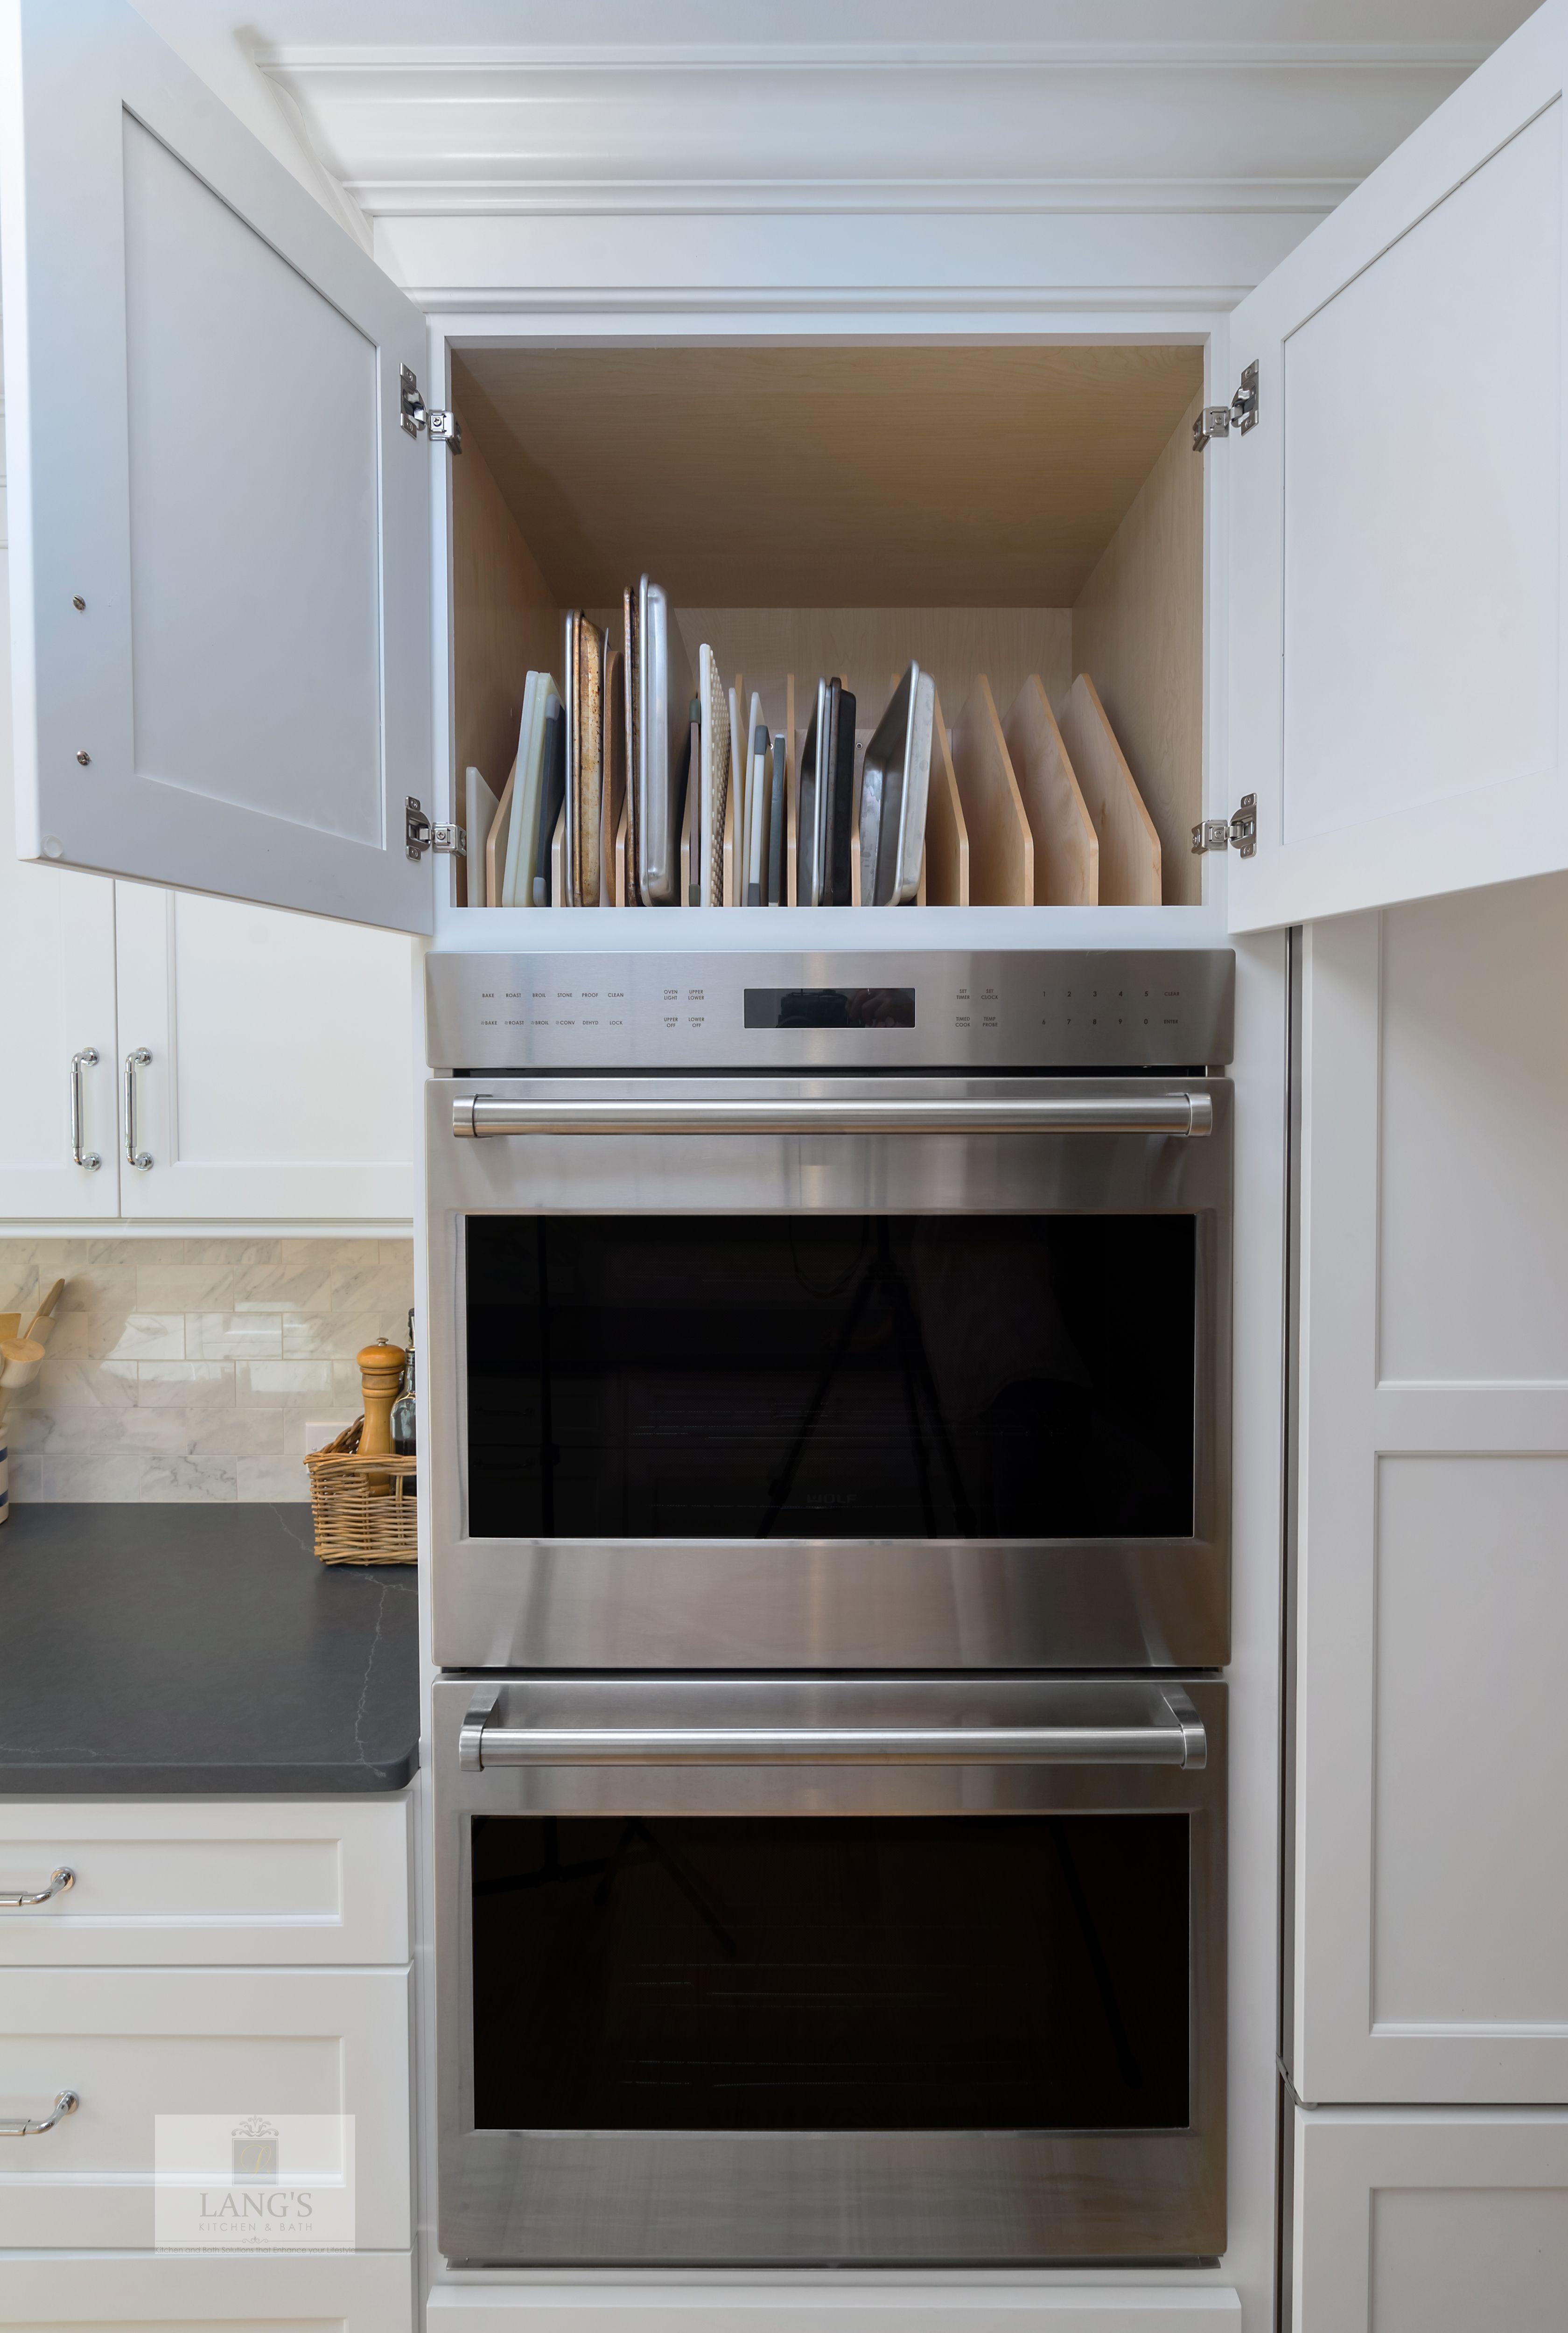 23 Transitional Galley Kitchen Design Yardley Pa Ideas Galley Style Kitchen Galley Kitchen Design White Kitchen Cabinets